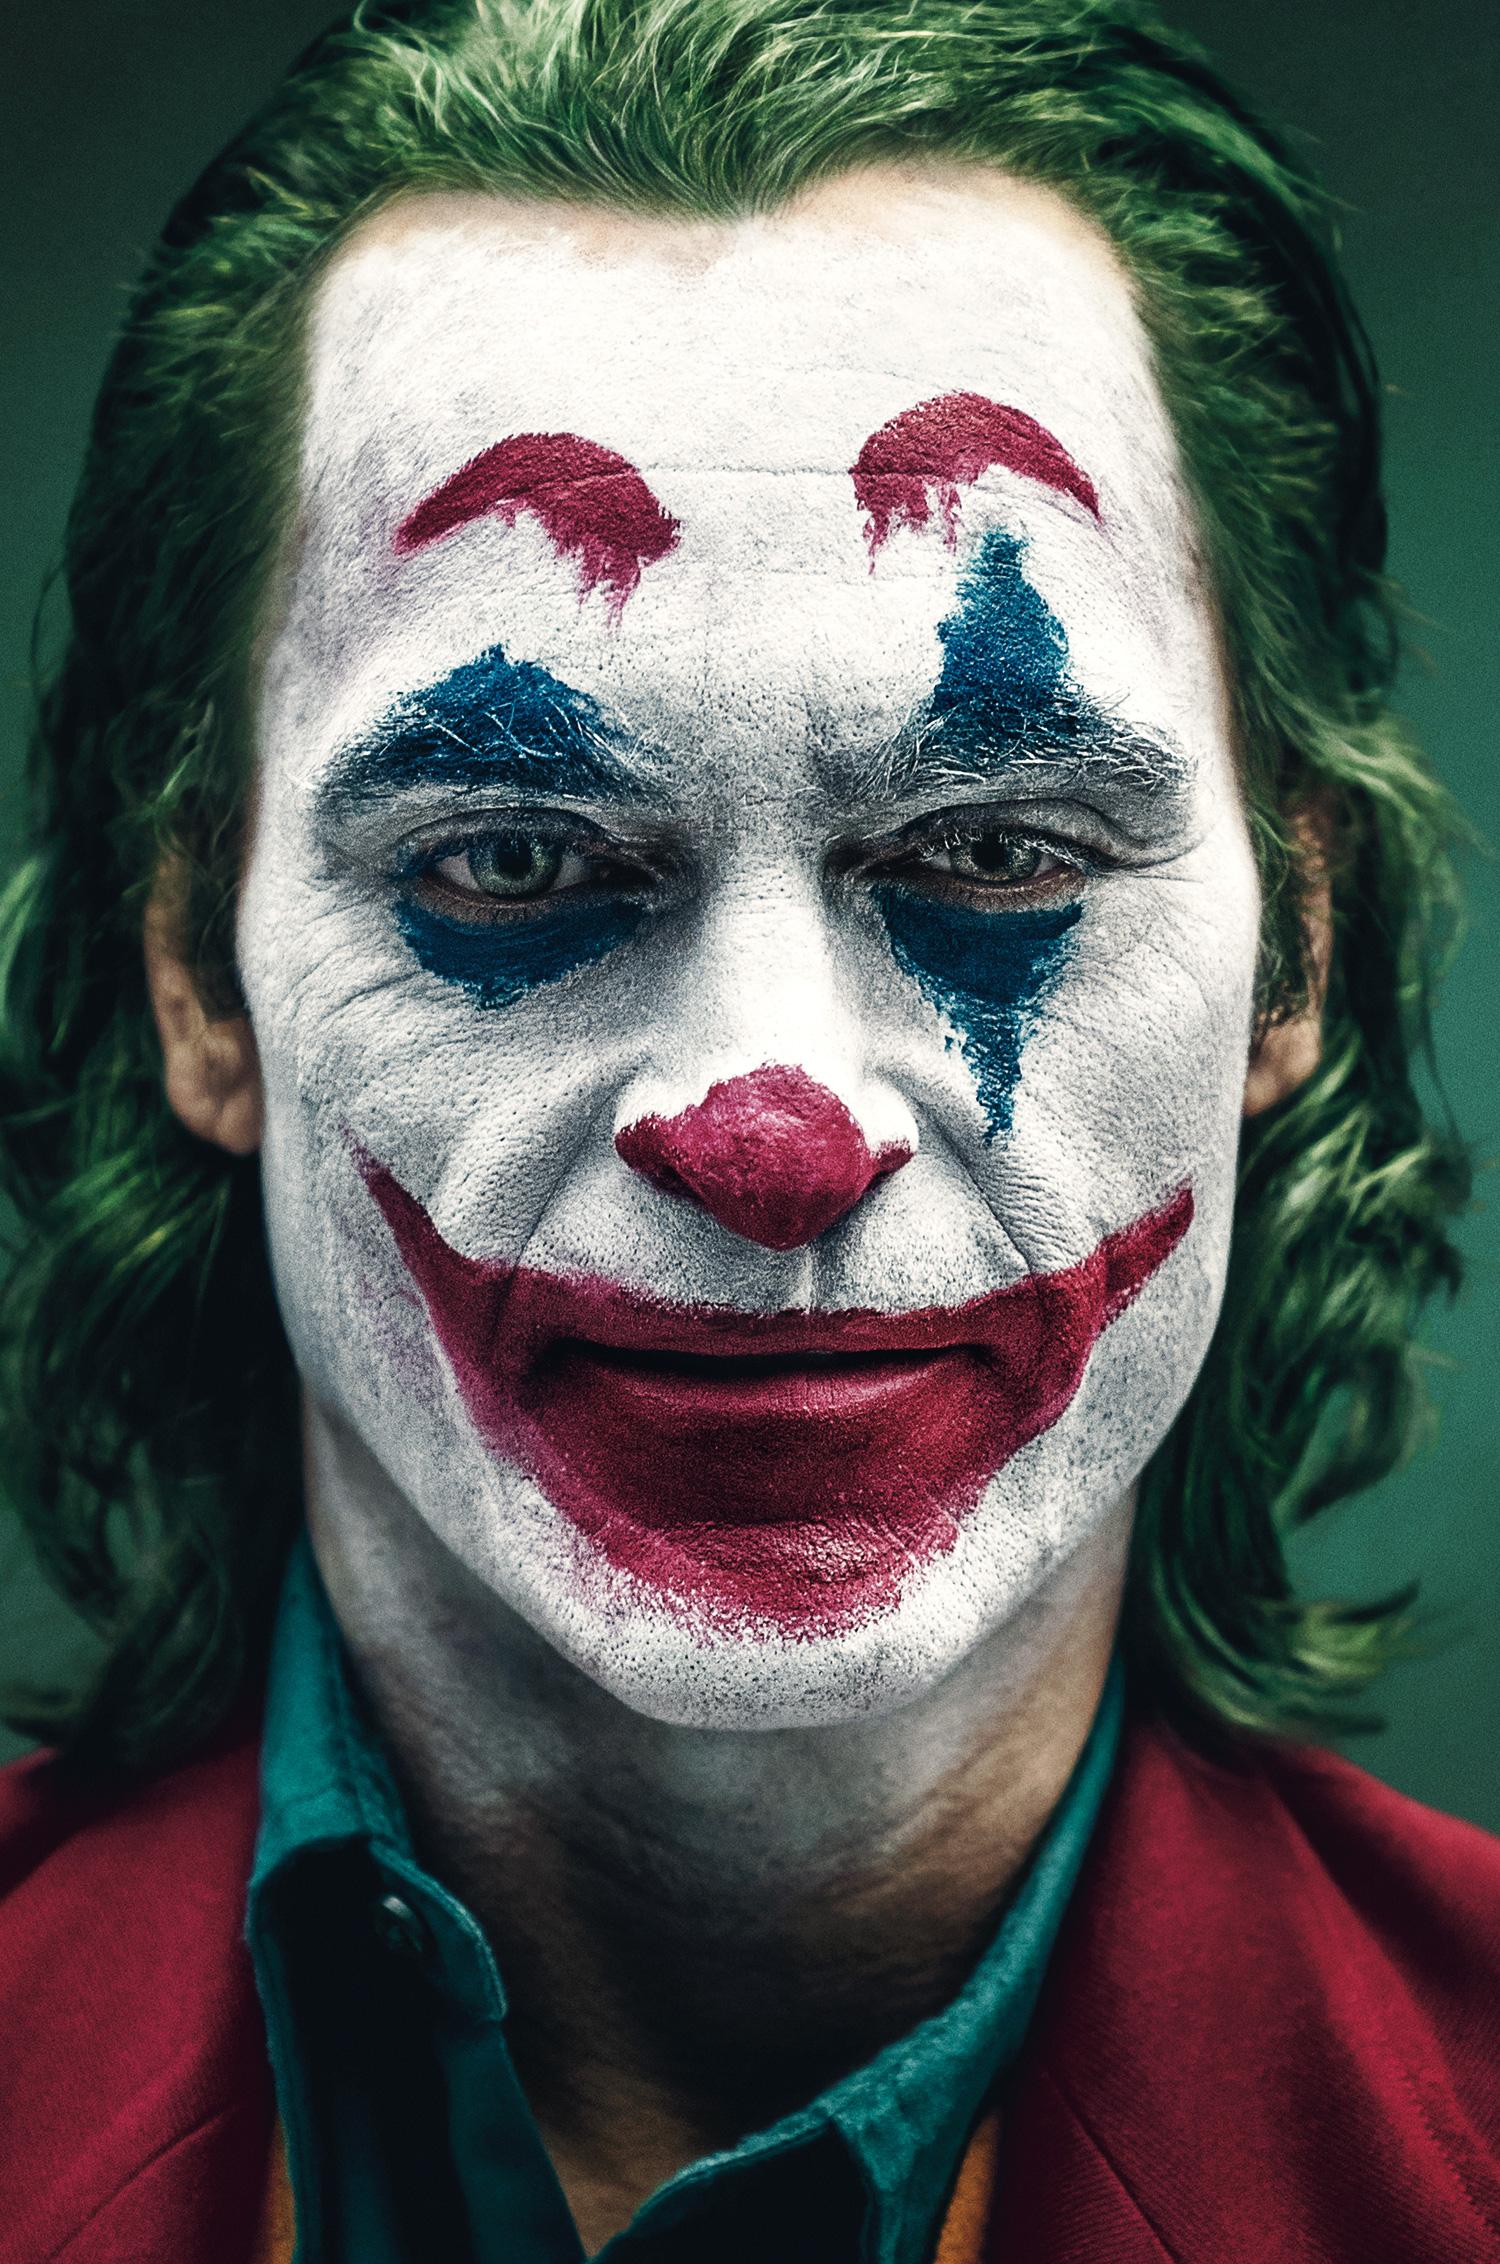 Google Image Result For Https Vignette Wikia Nocookie Net Batman Images C C0 Facepaint Png Revision Latest Cb 20200 Joker Painting Joker Makeup Joker Artwork